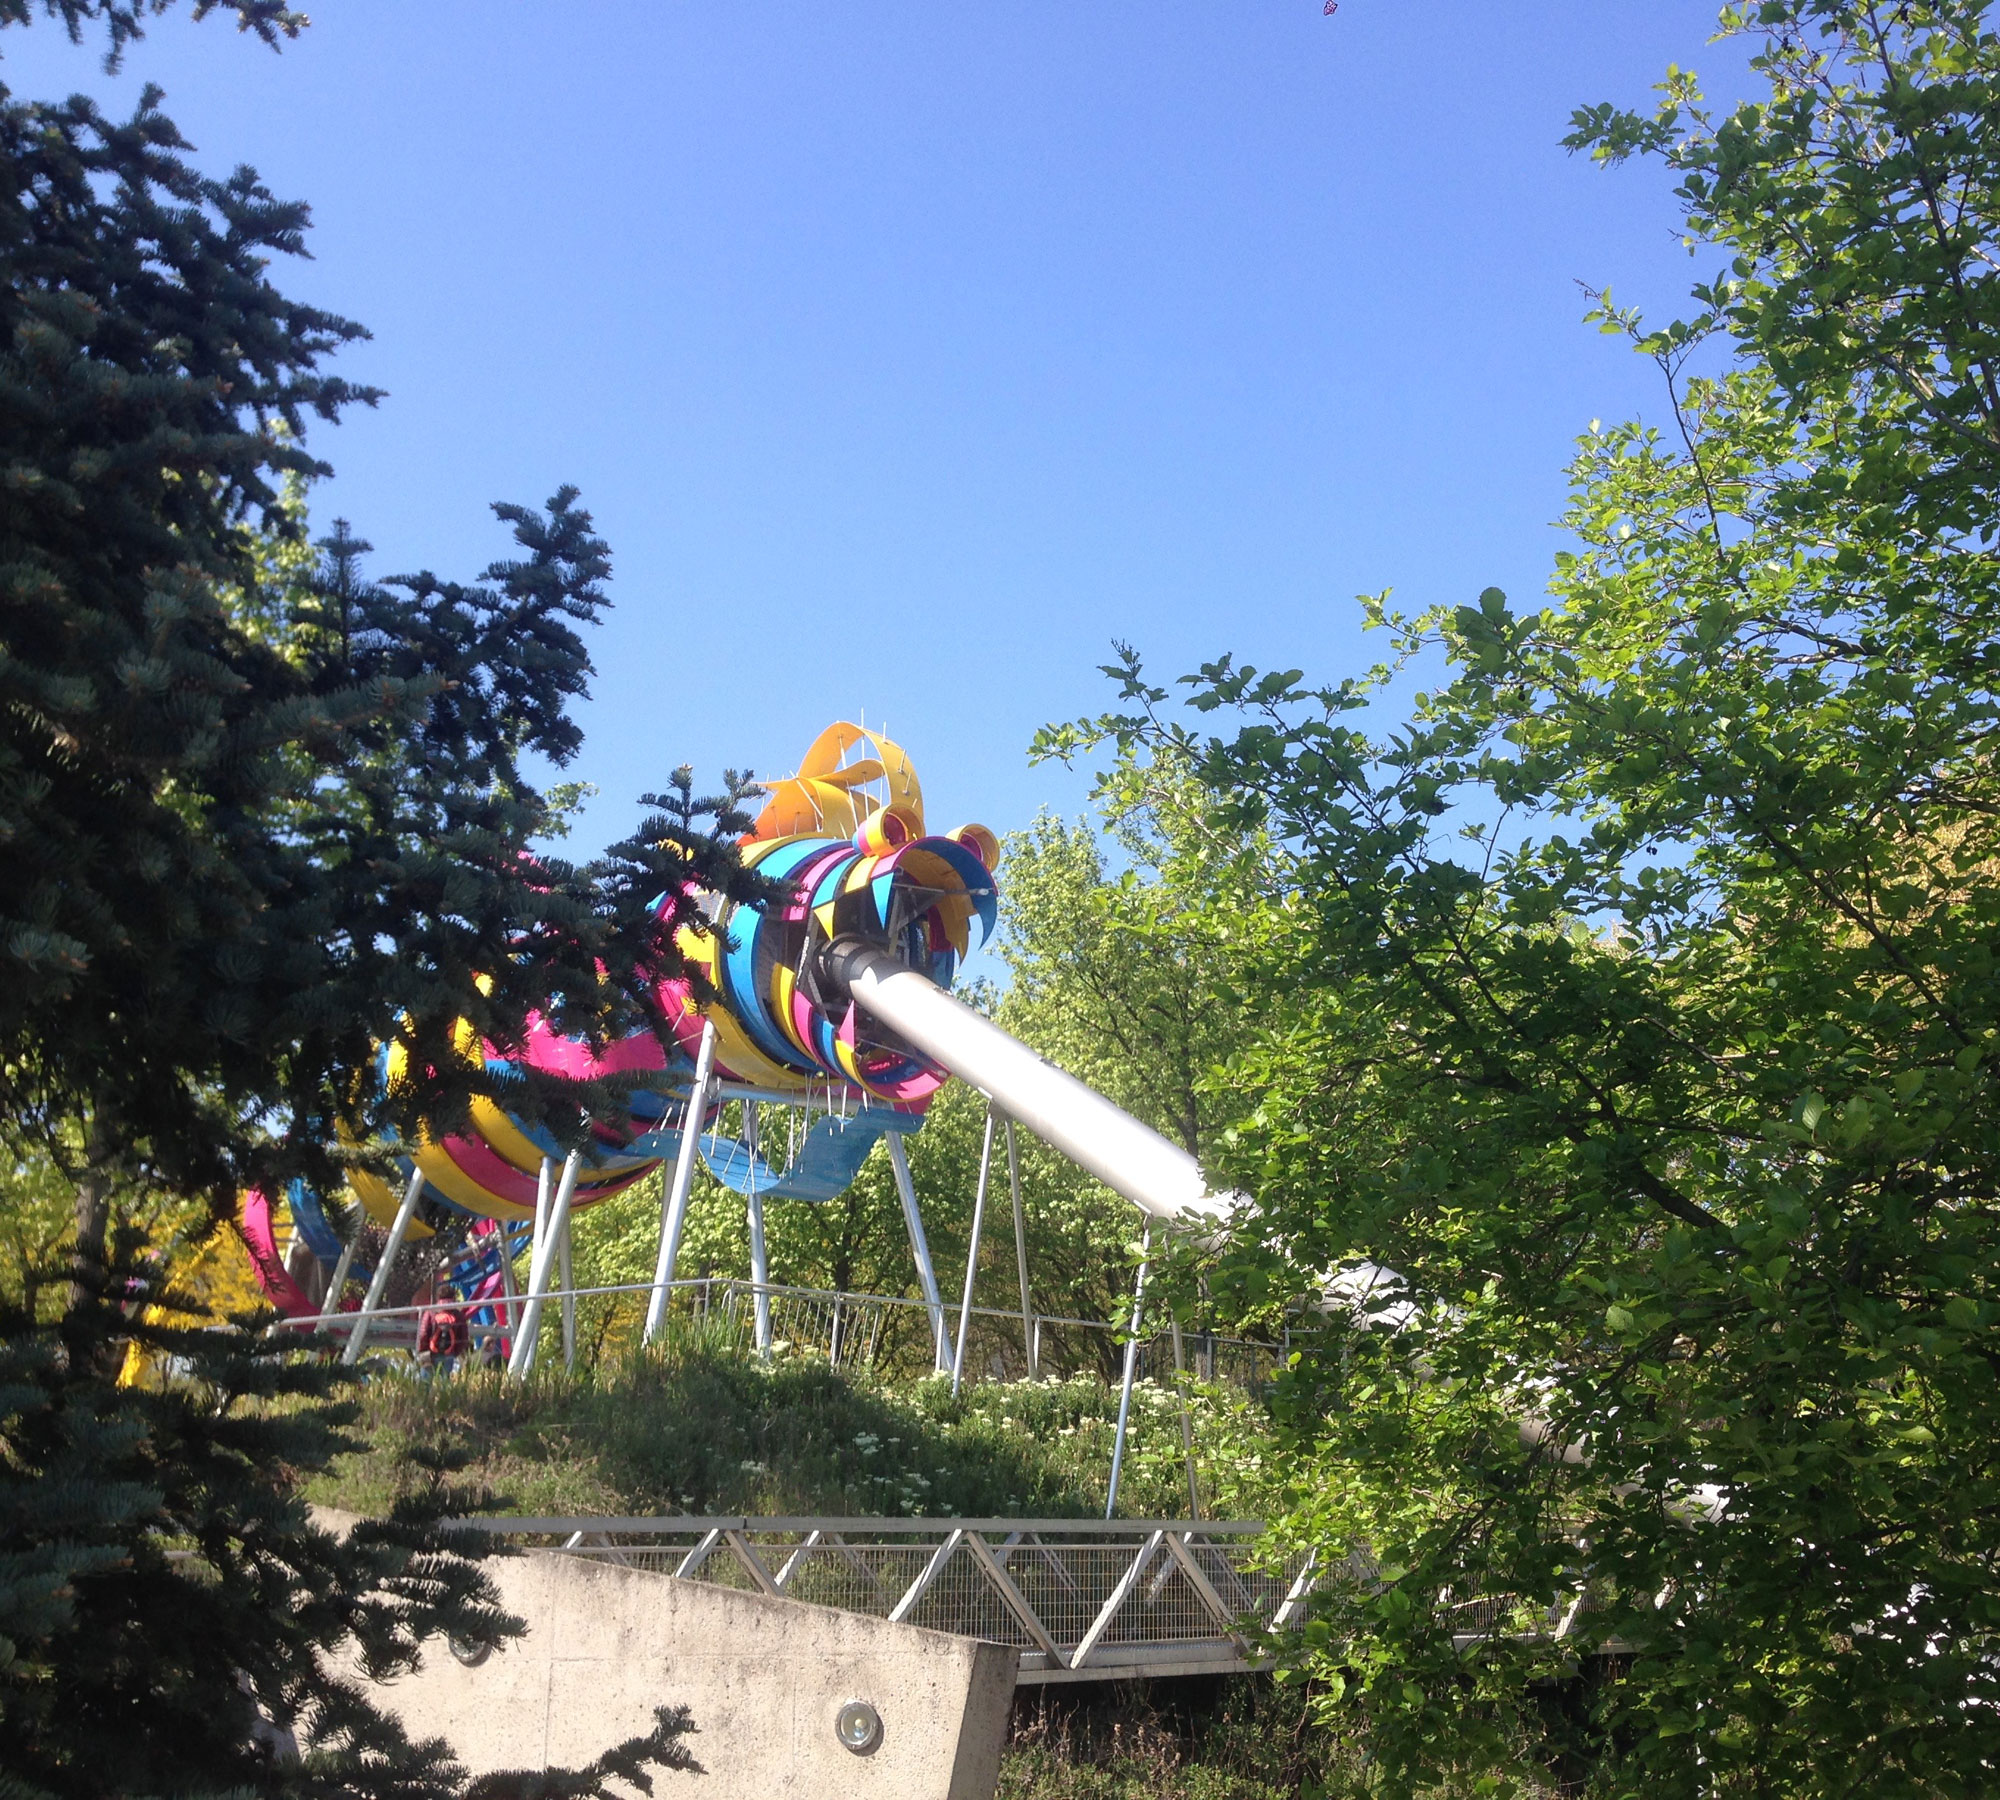 Paris mit Kindern: Spielplatz im Parc de la Villette // HIMBEER